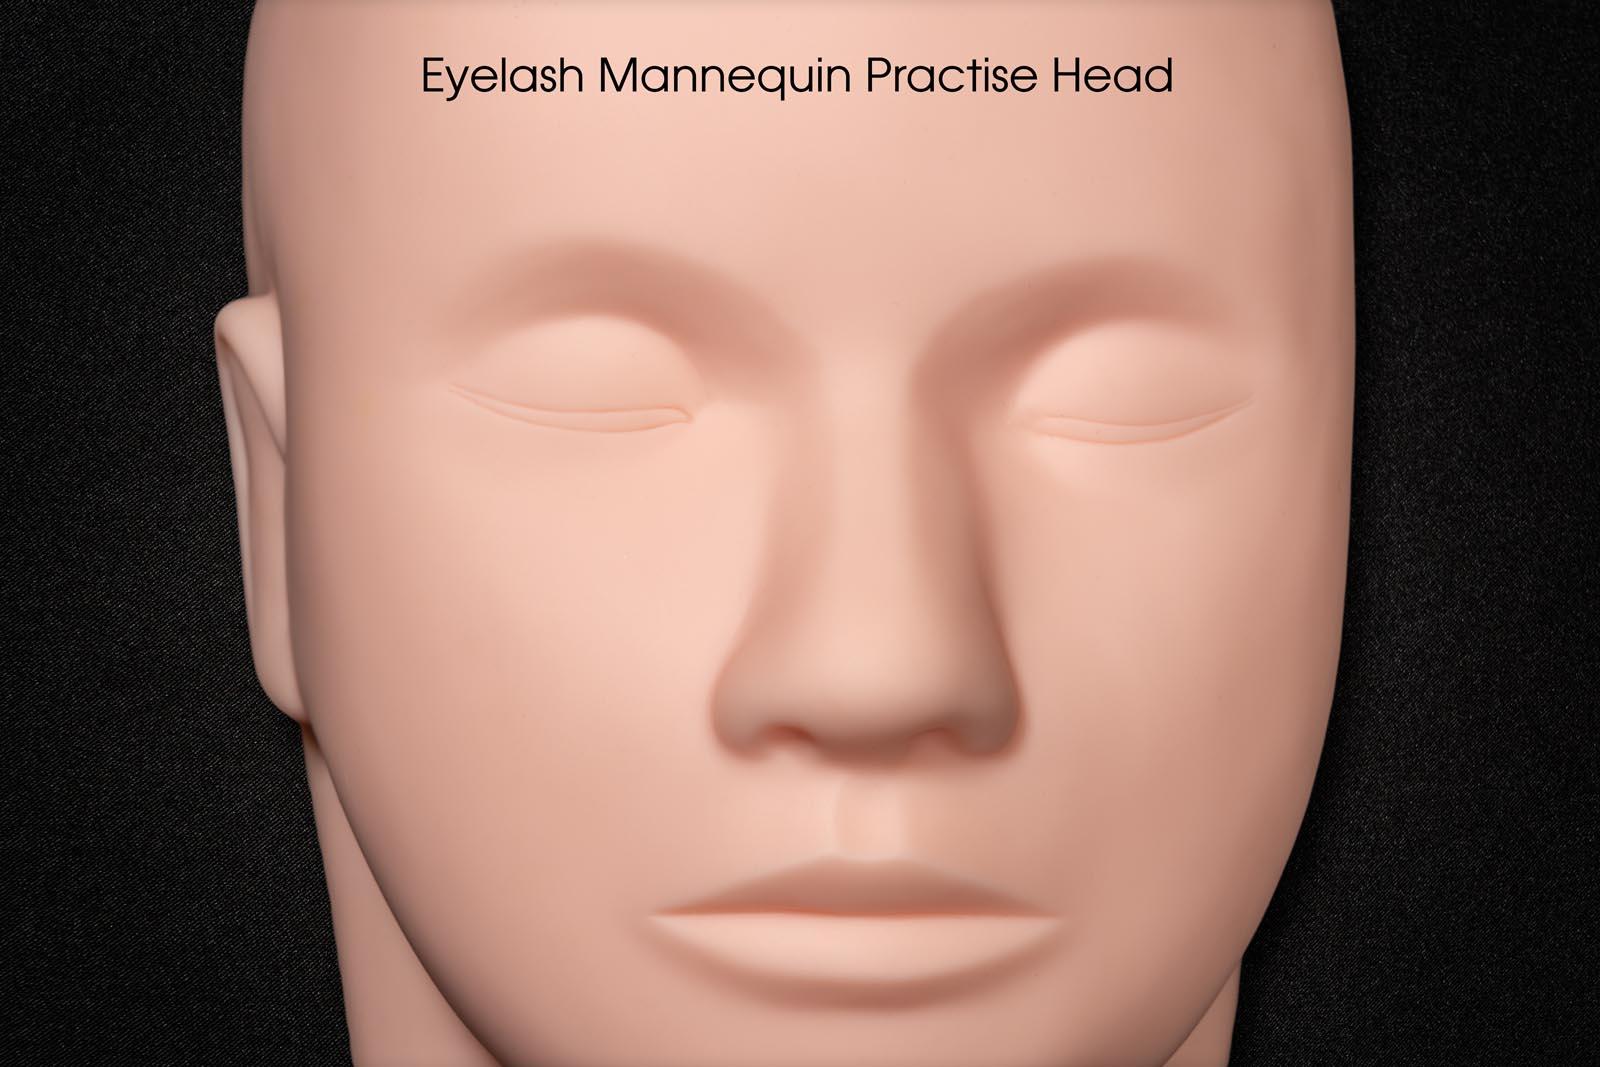 09 Eyelash Mannequin Head.jpg